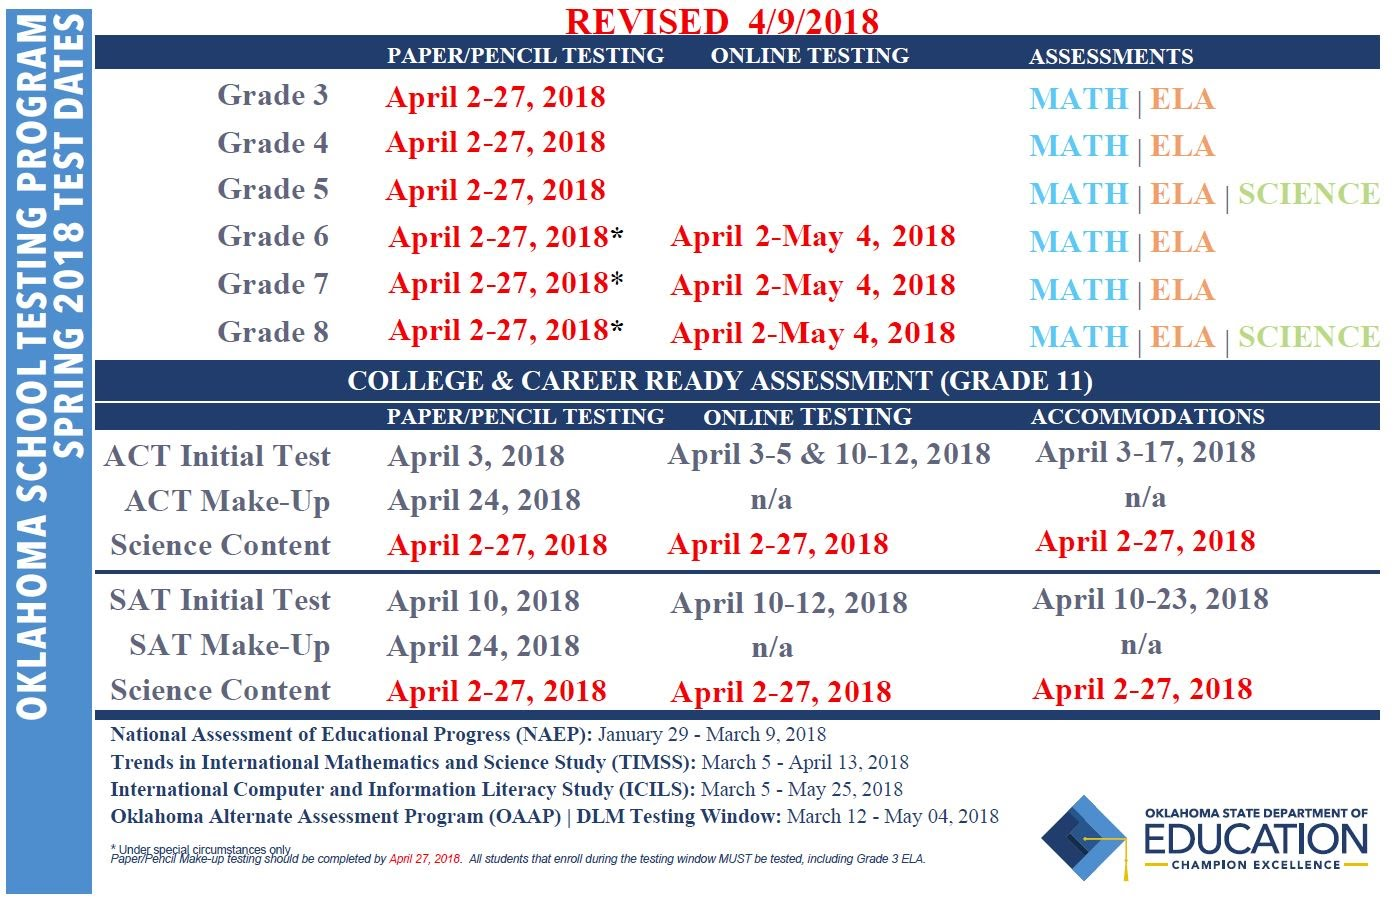 State testing calendar extension